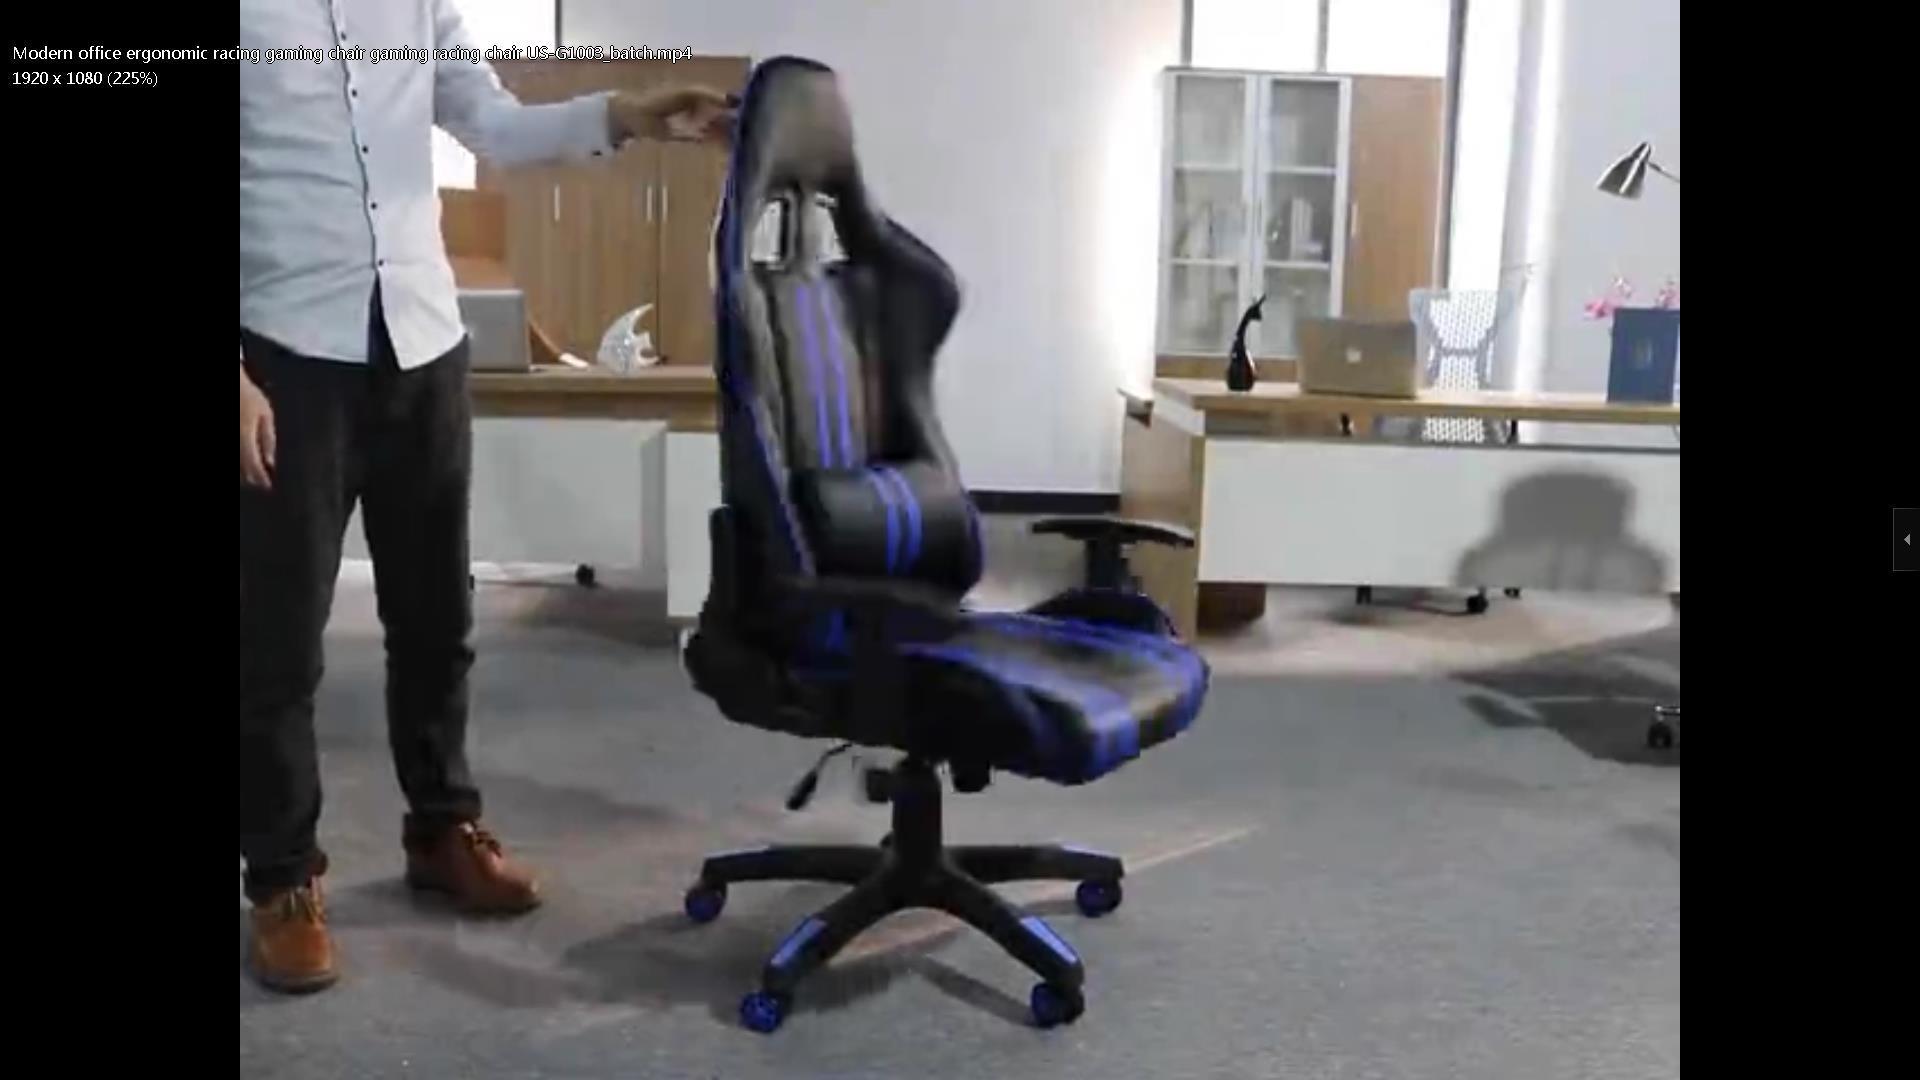 Modern office ergonomic racing gaming chair gaming racing chair US-G1003